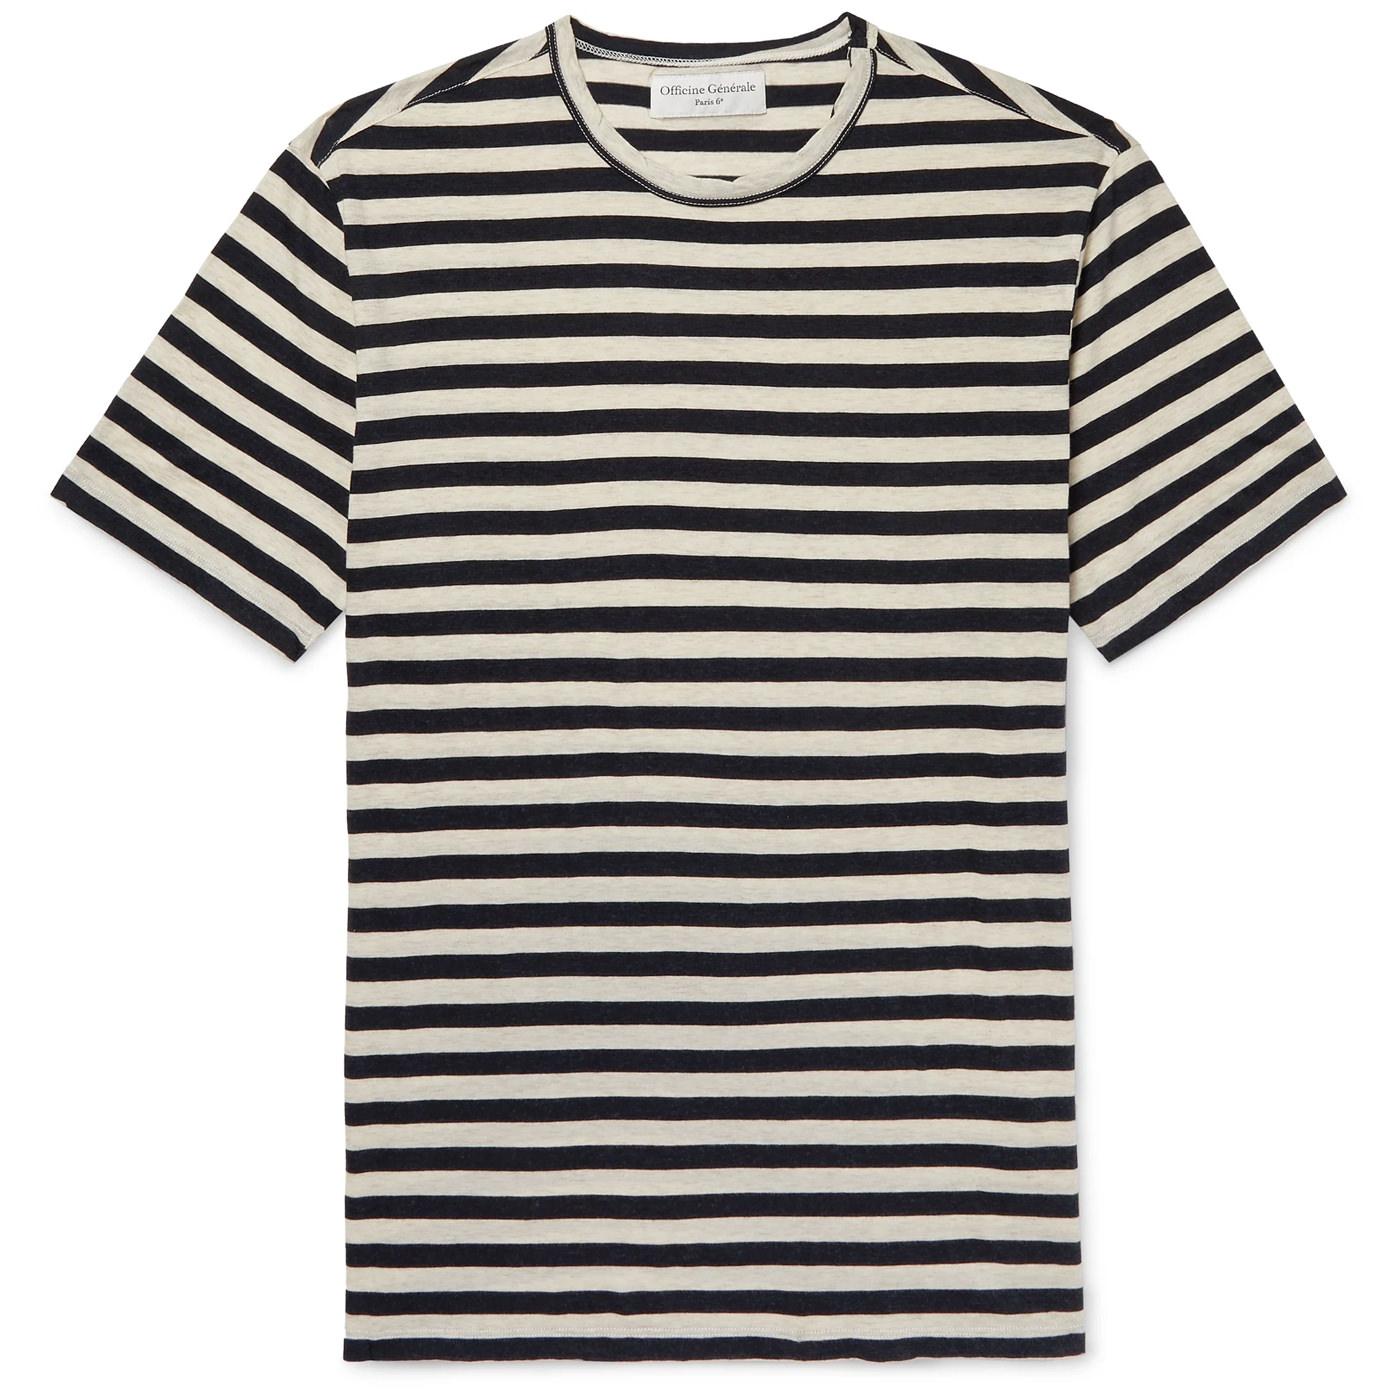 Style Mr Porter T-Shirt Marin Officine Générale